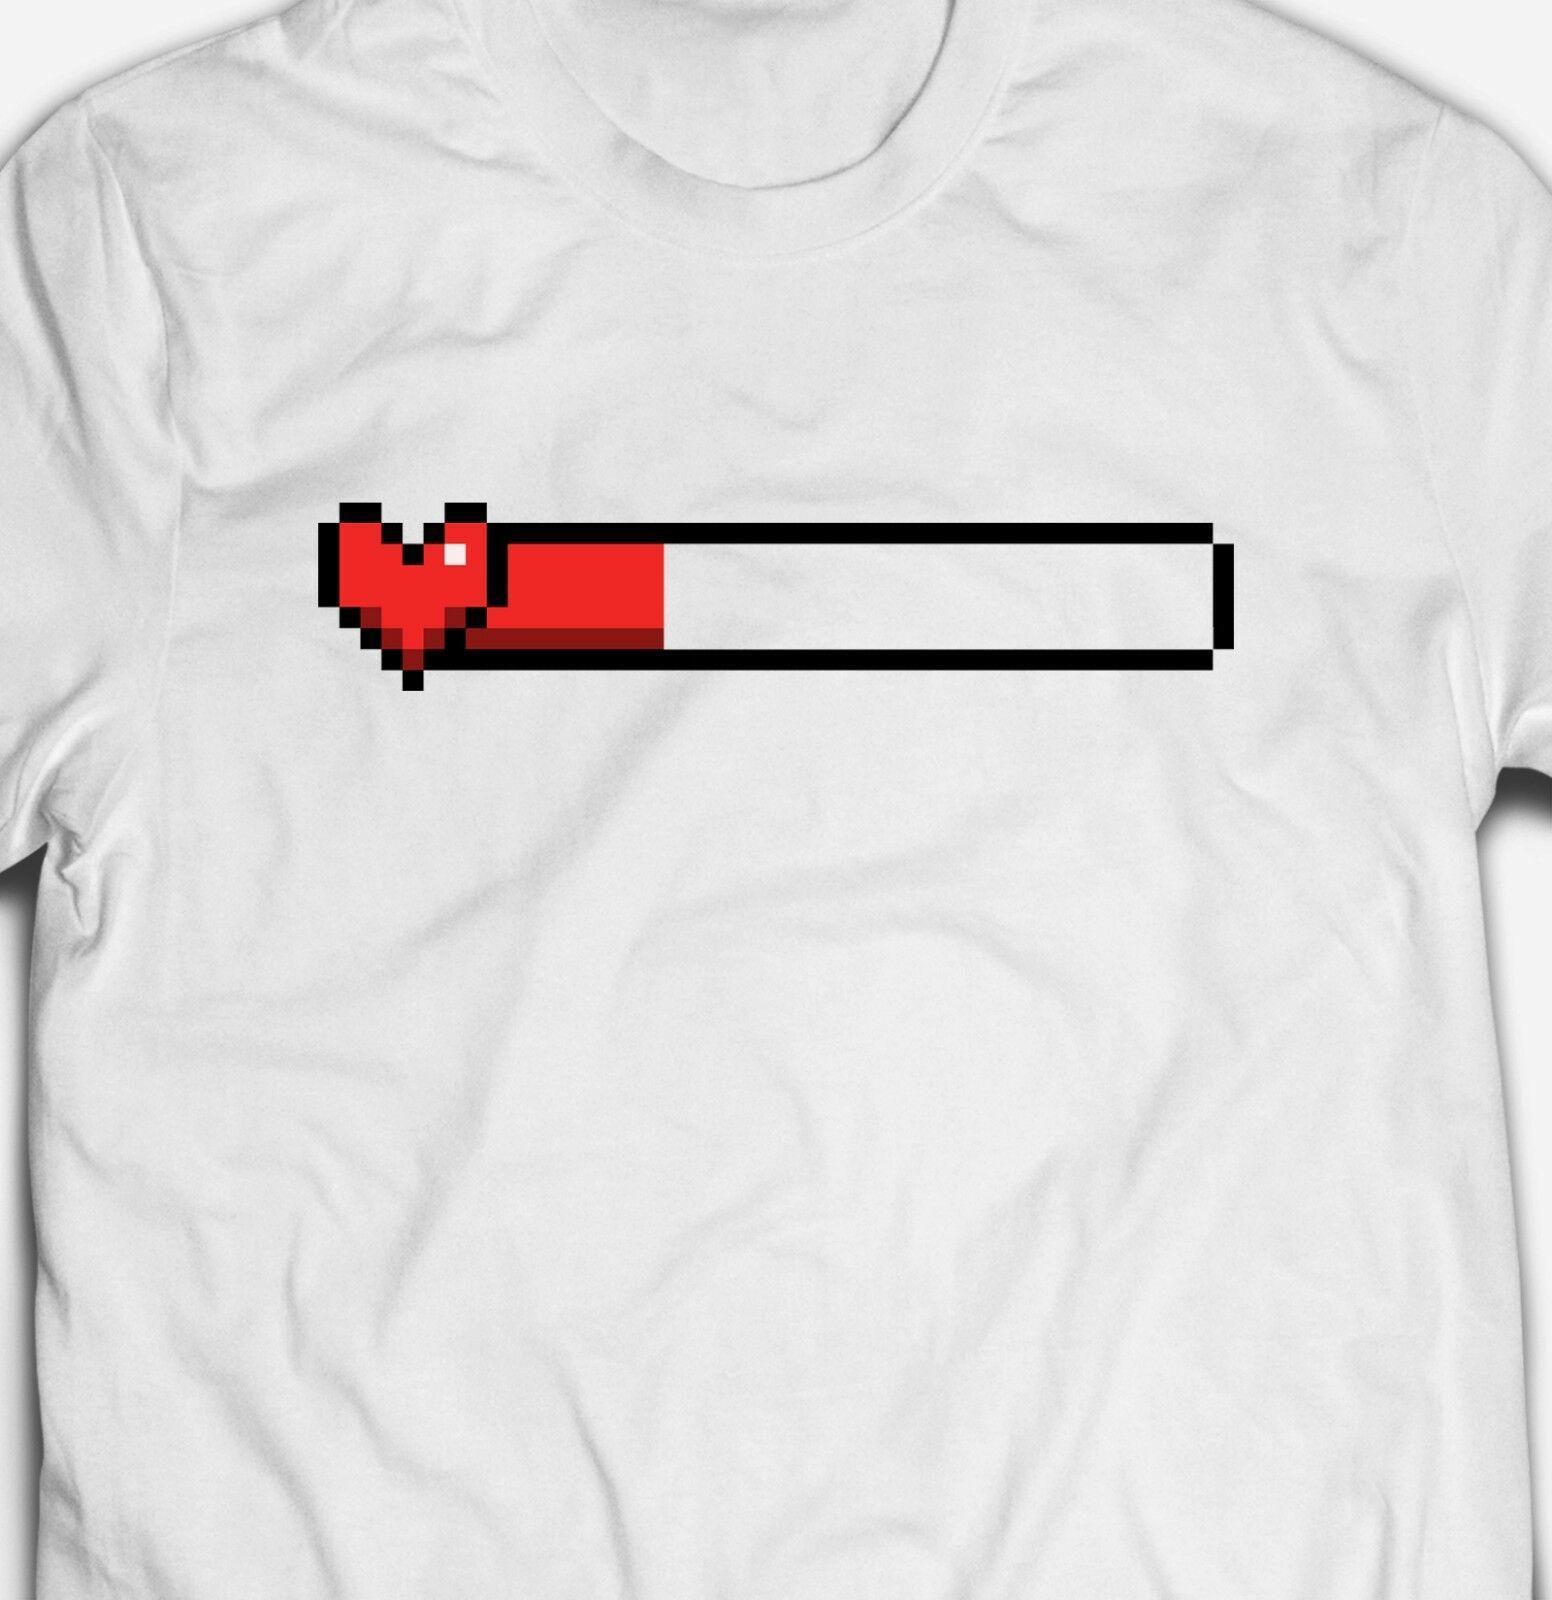 Pixelated Rétro Coeur Gamer Gaming Life Bar Pixel Geek T Shirt Pour Hommes